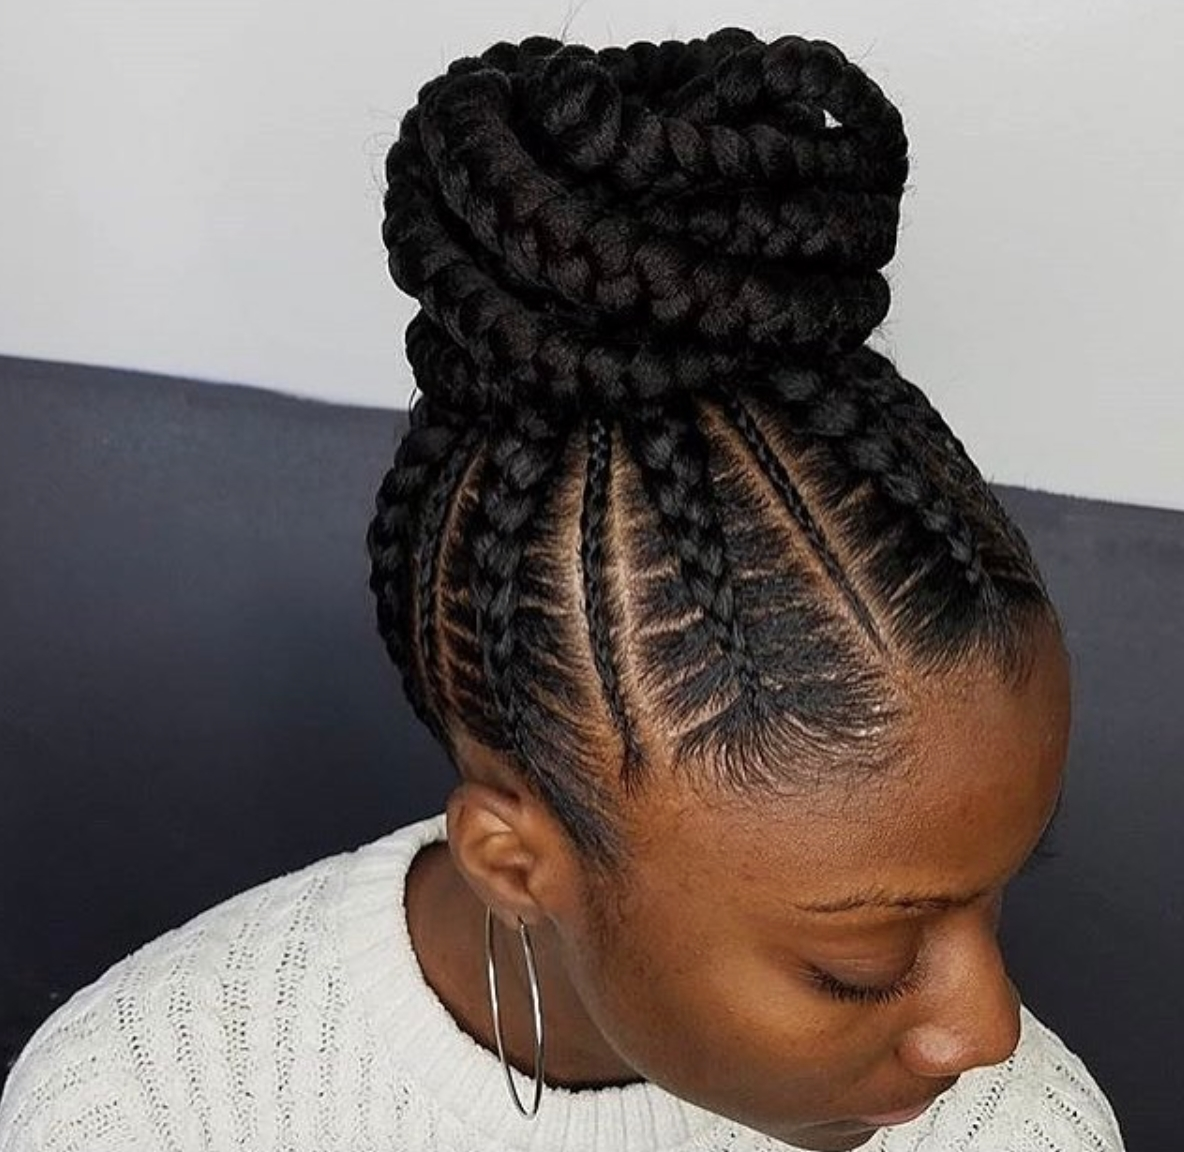 15 Best Ideas of Braided Bun Updo African American Hairstyles